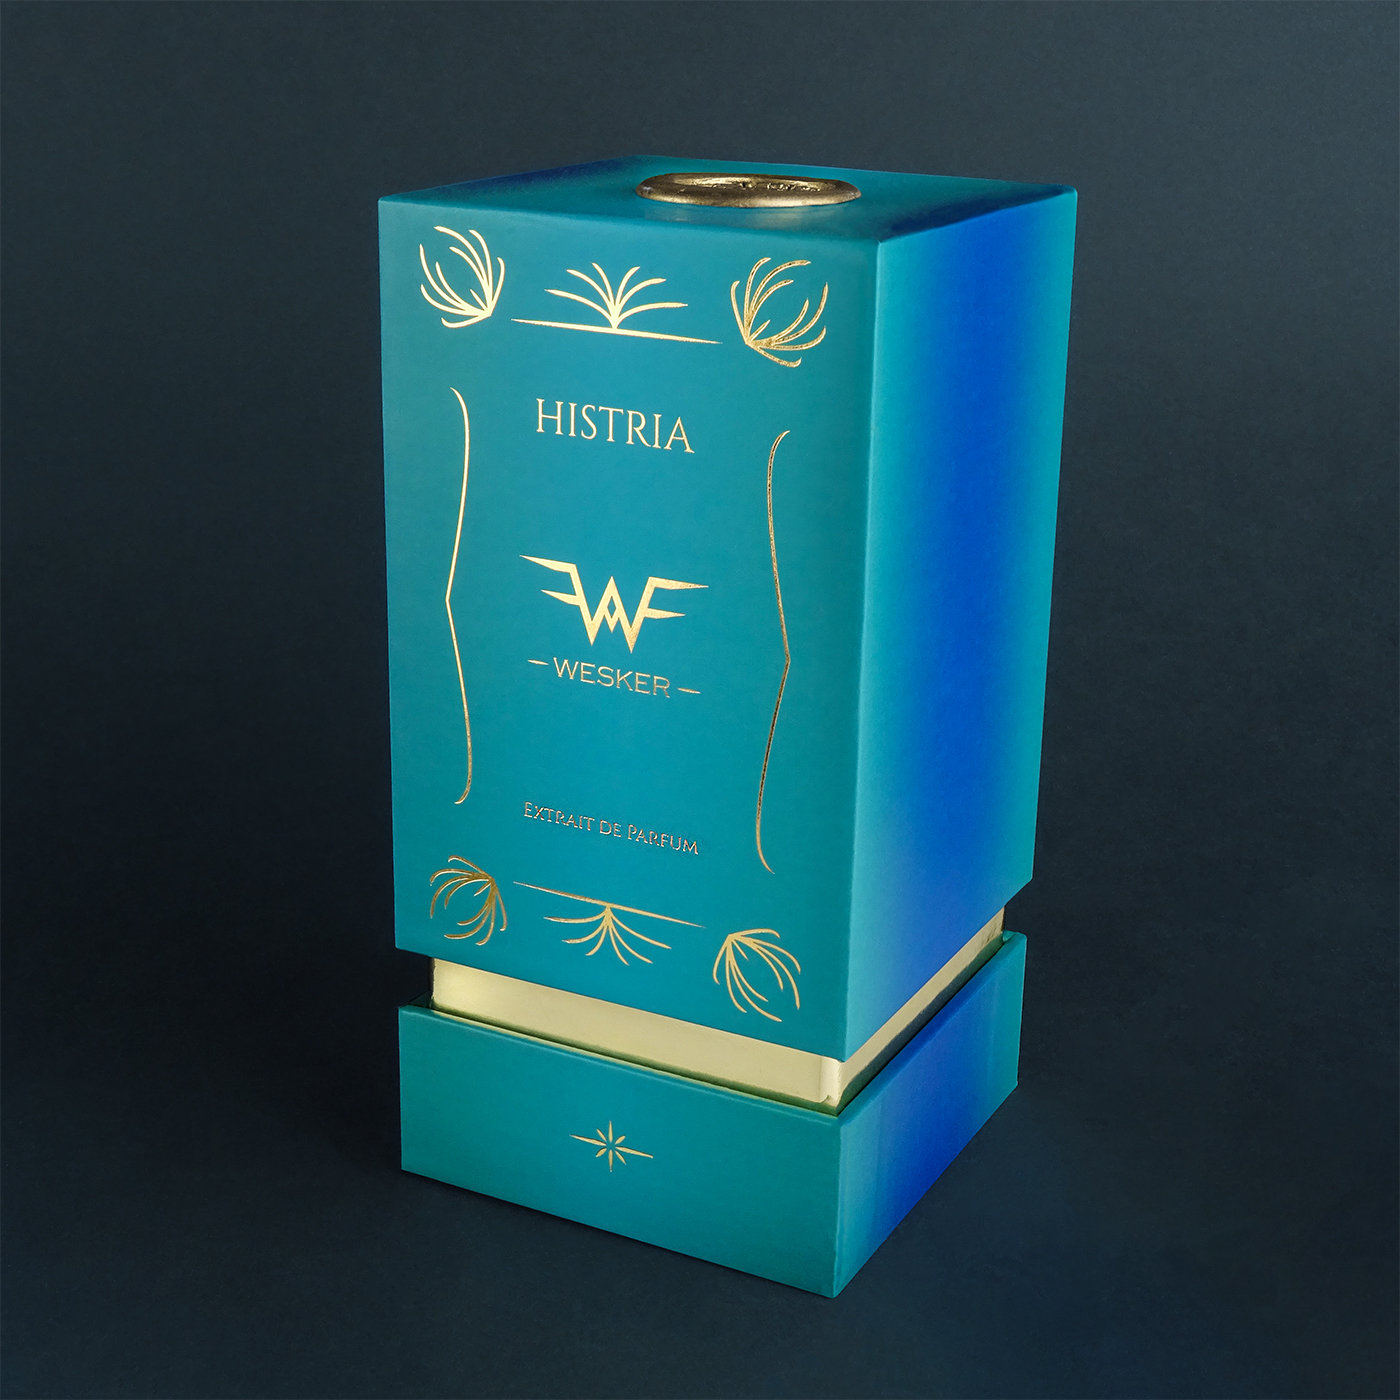 Wesker_Histria_Packaging_1x1